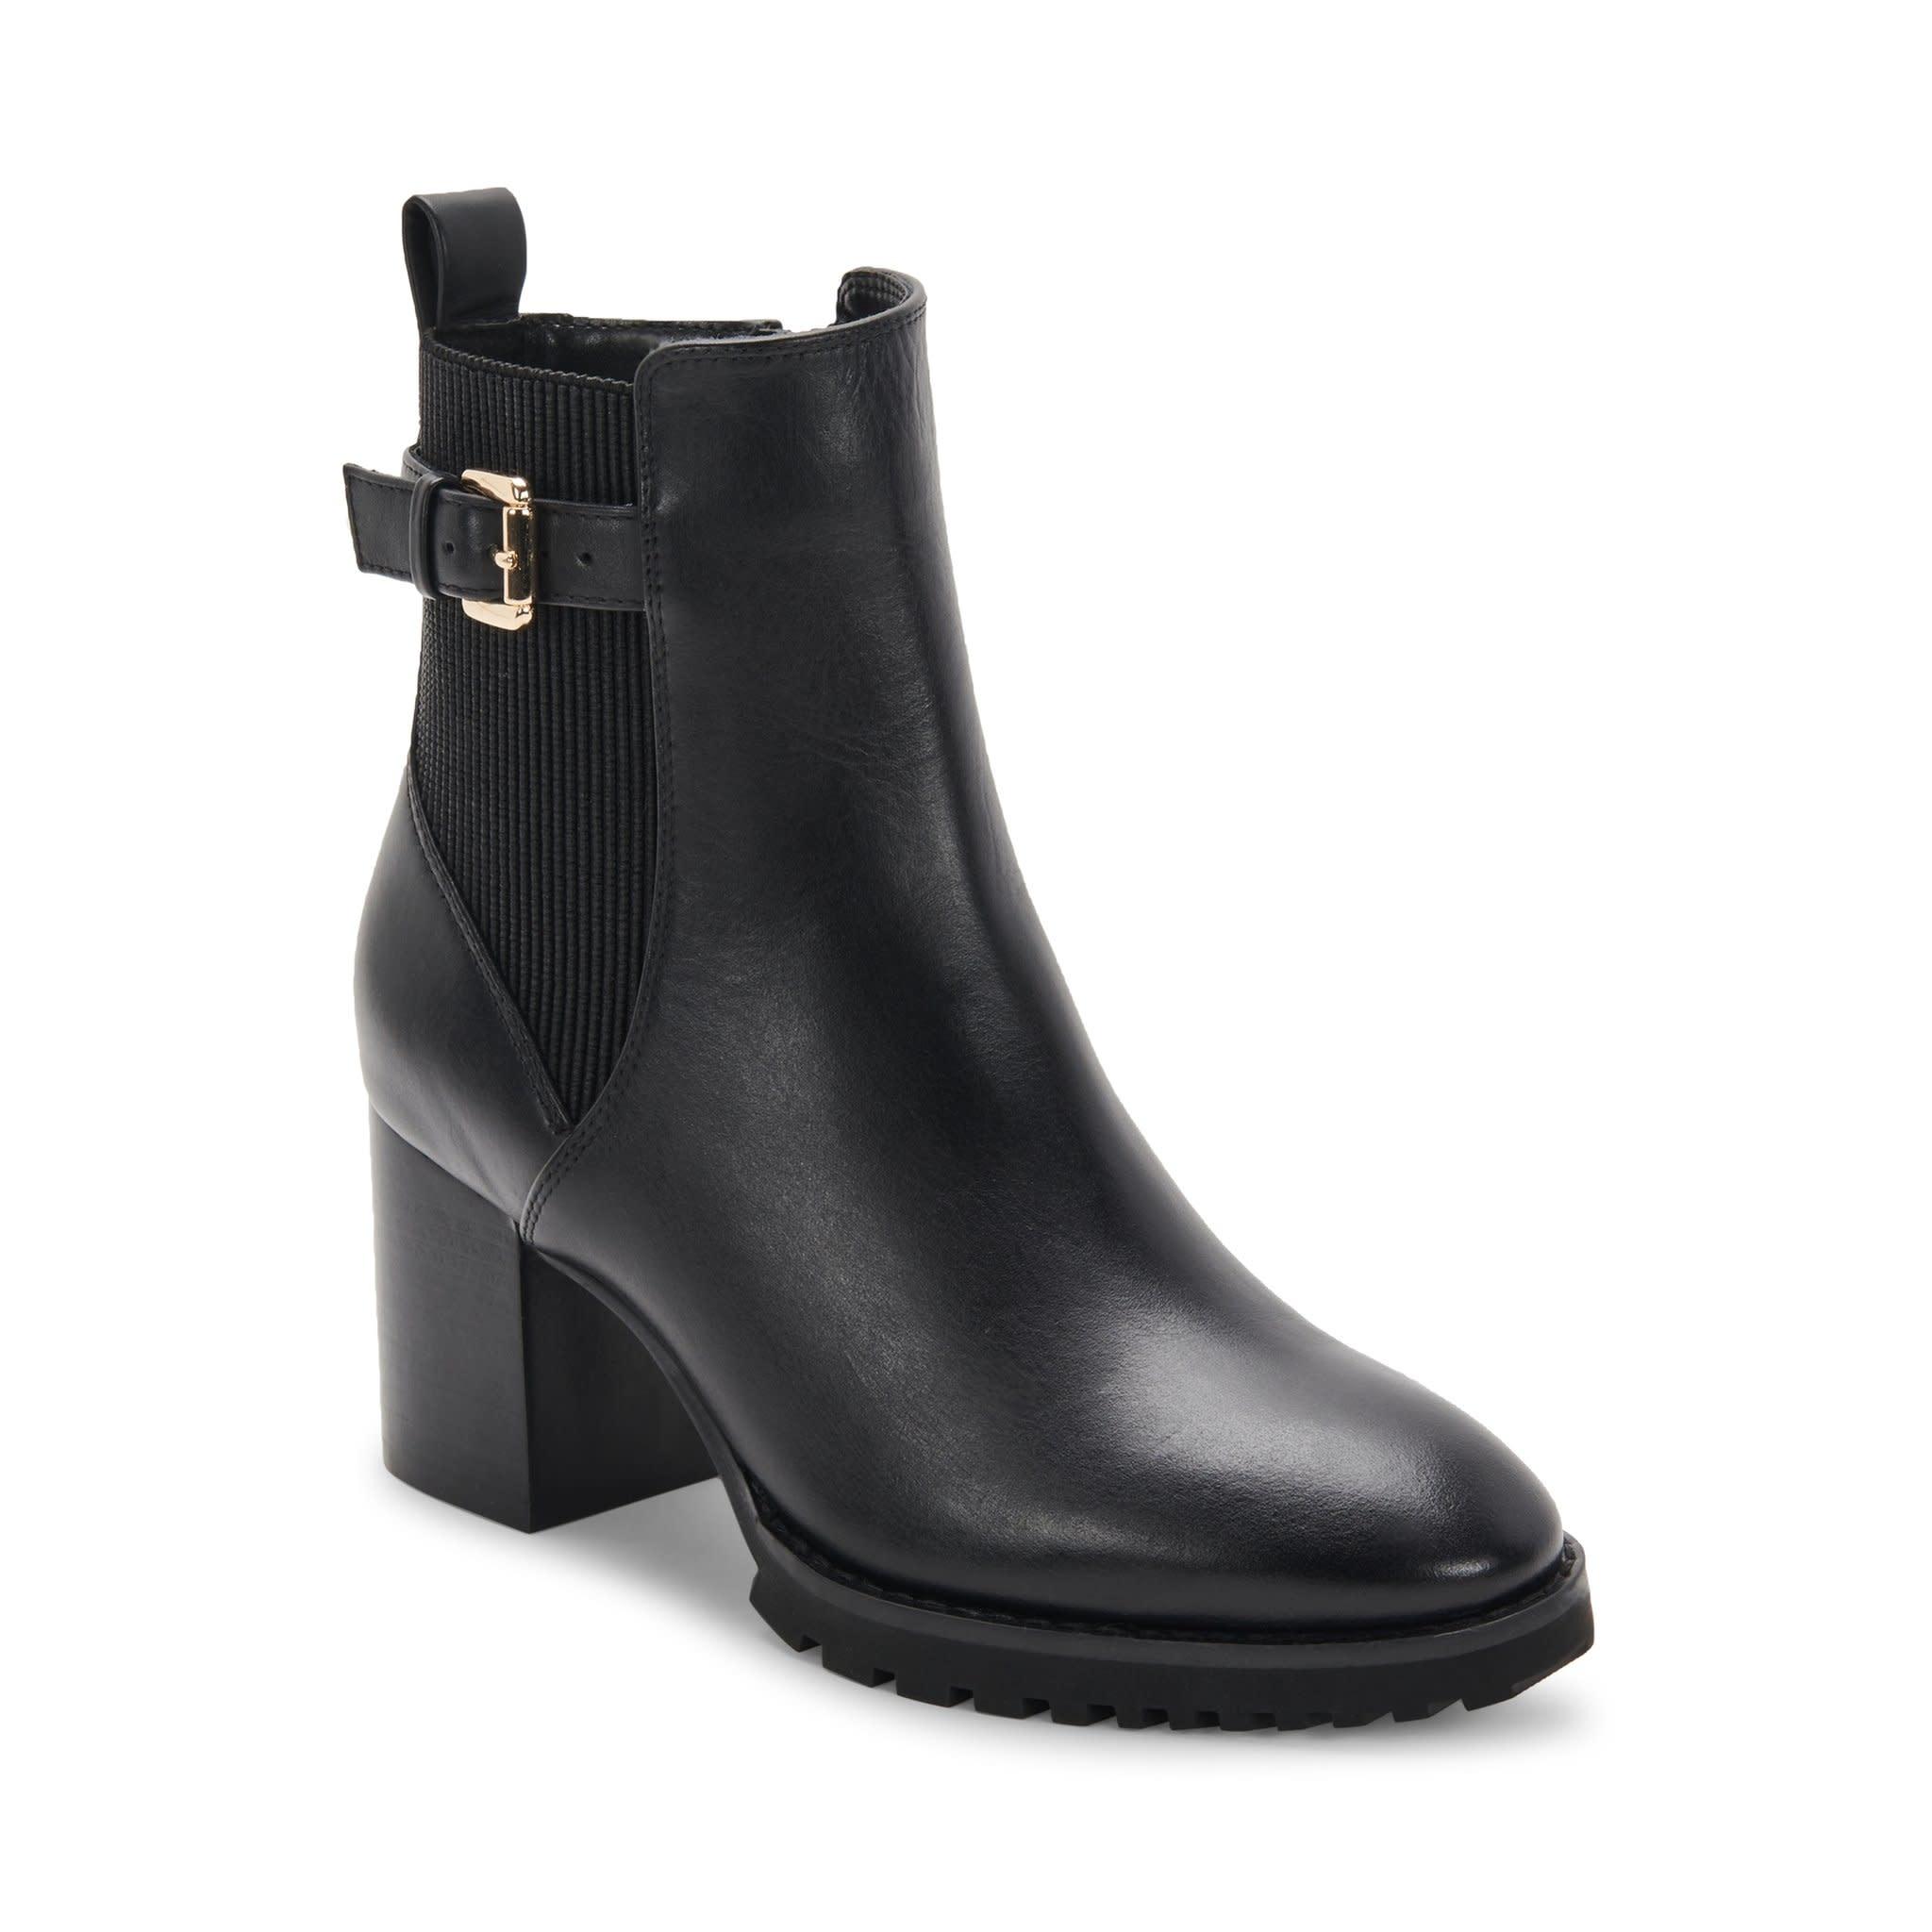 Tobi Short Waterproof Boot